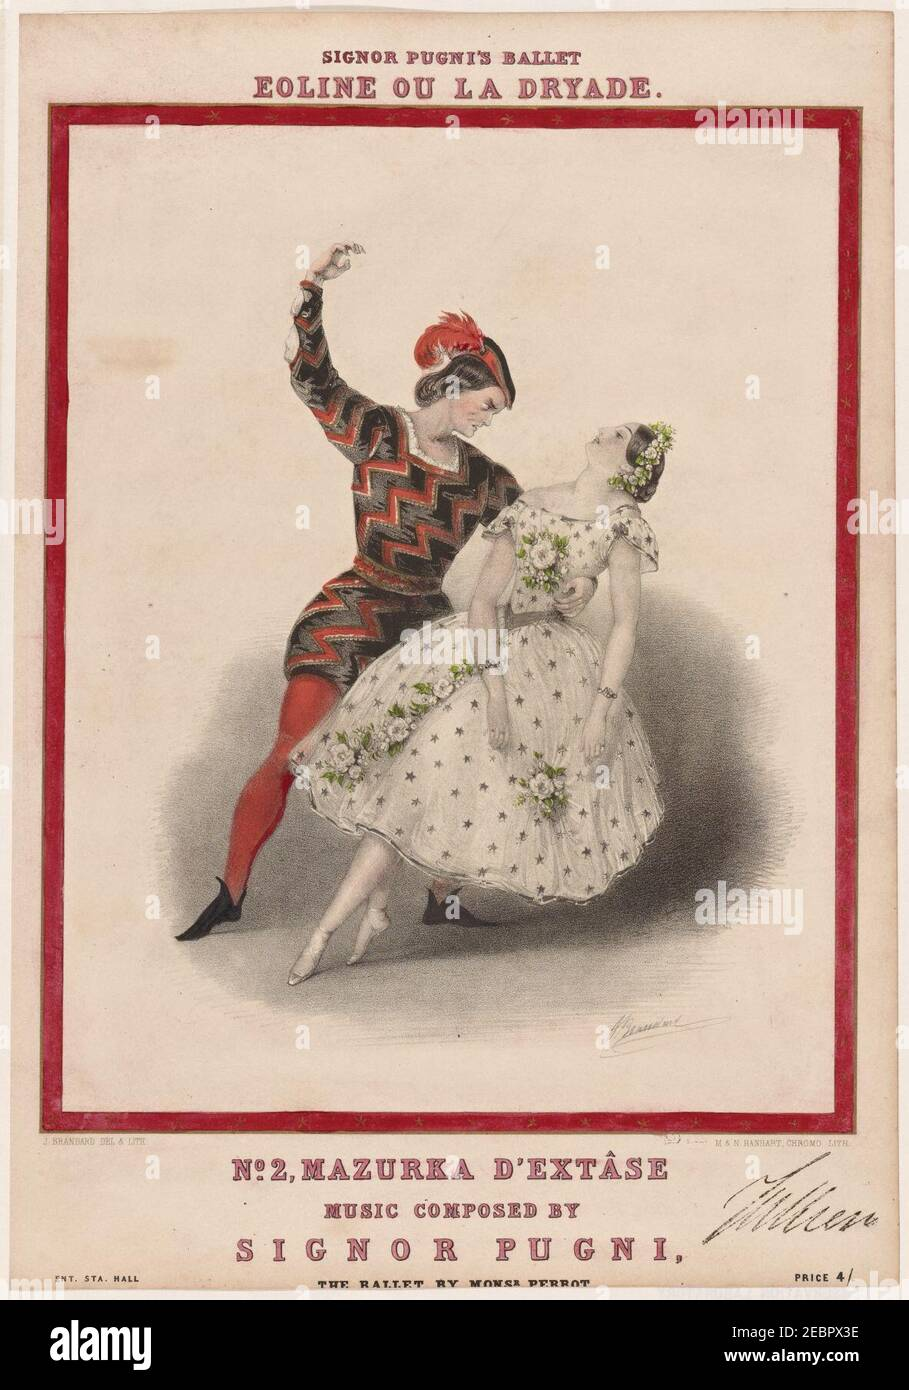 Signor Pugni's ballet Eoline ou La dryade. No. 2, Mazurka d'extâse Stock Photo